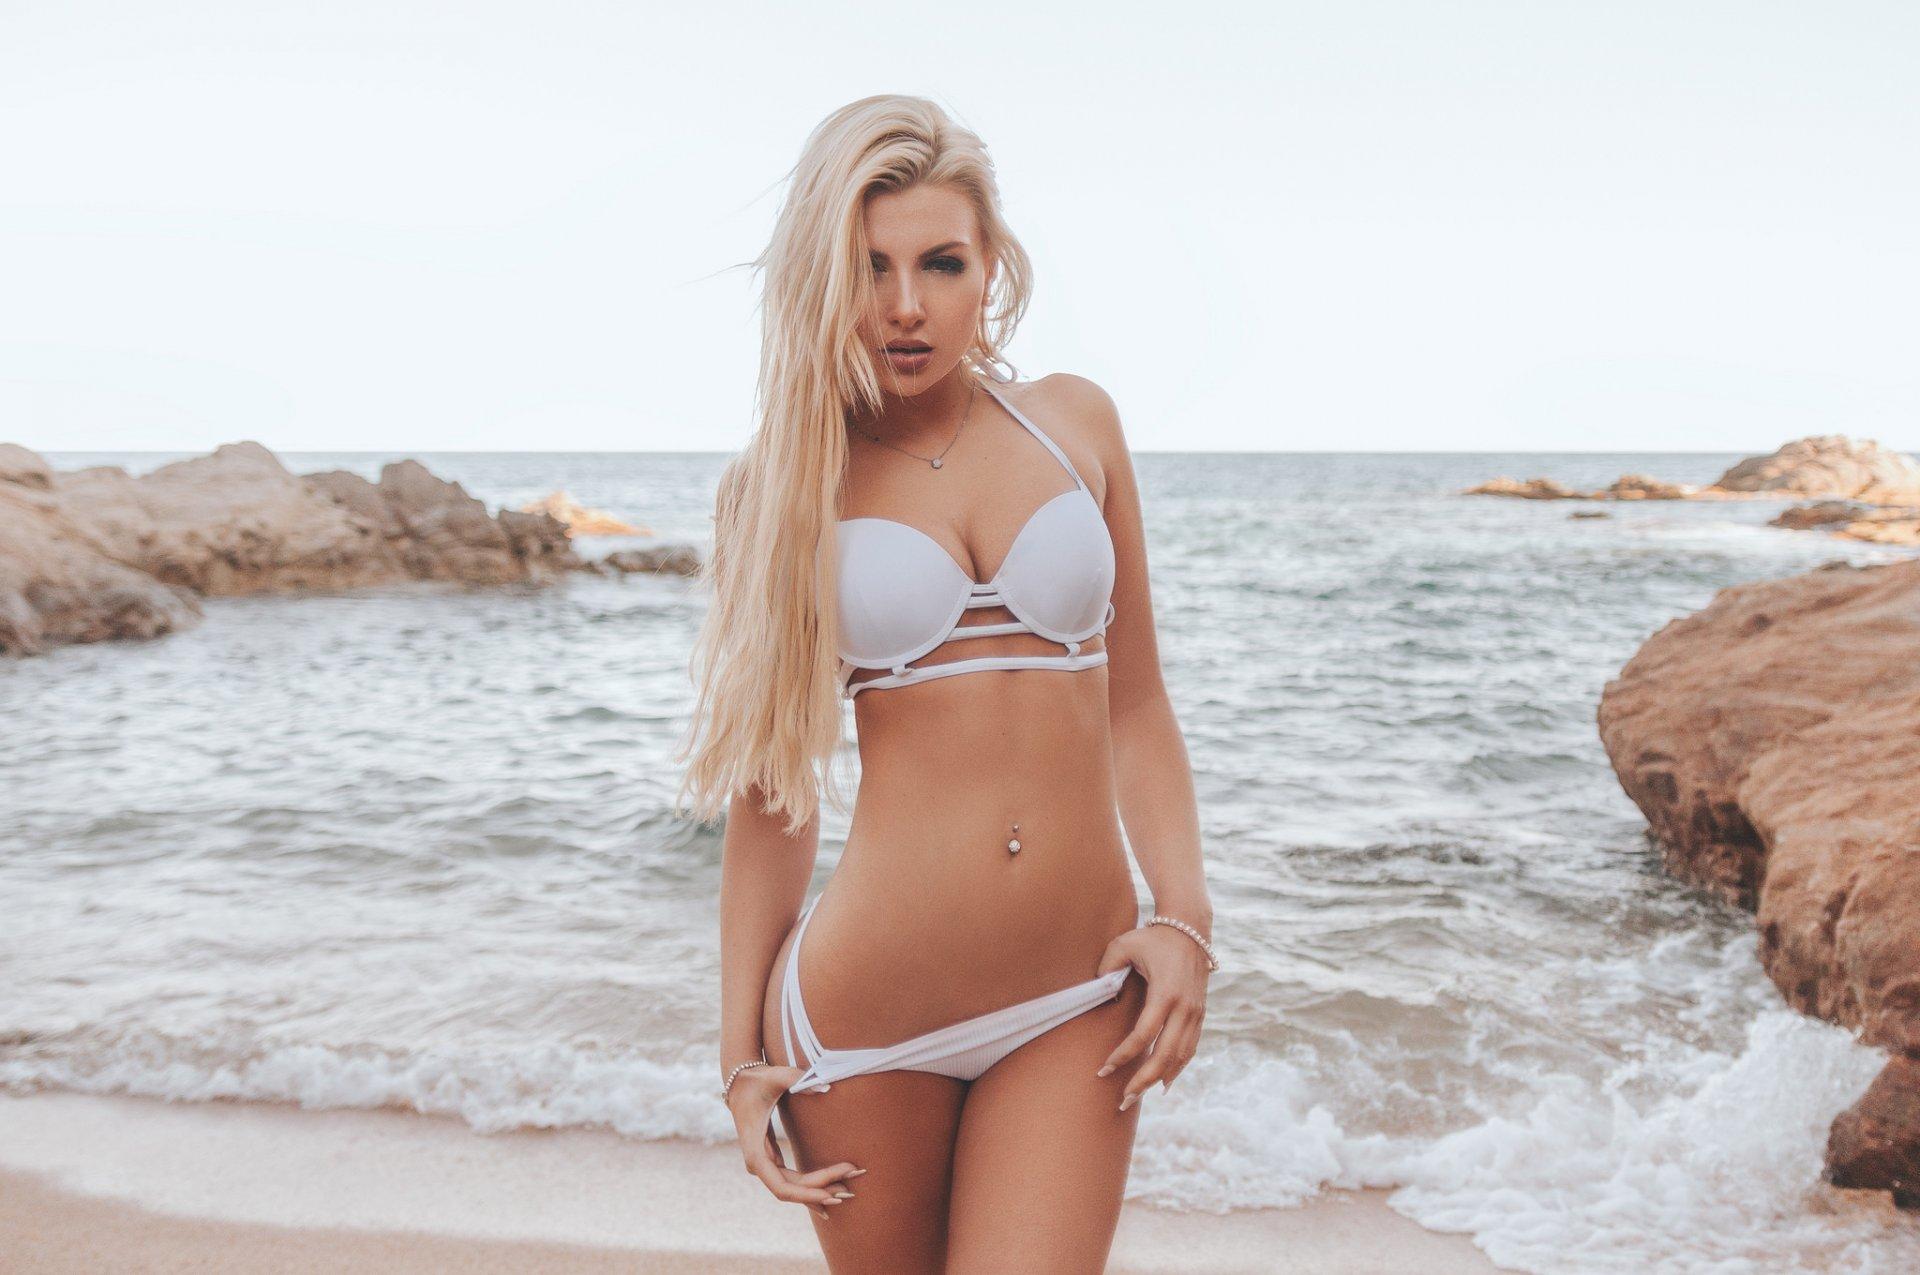 sexy-blonde-model-woman-erotic-babe-gorgeous-beautiful.jpg